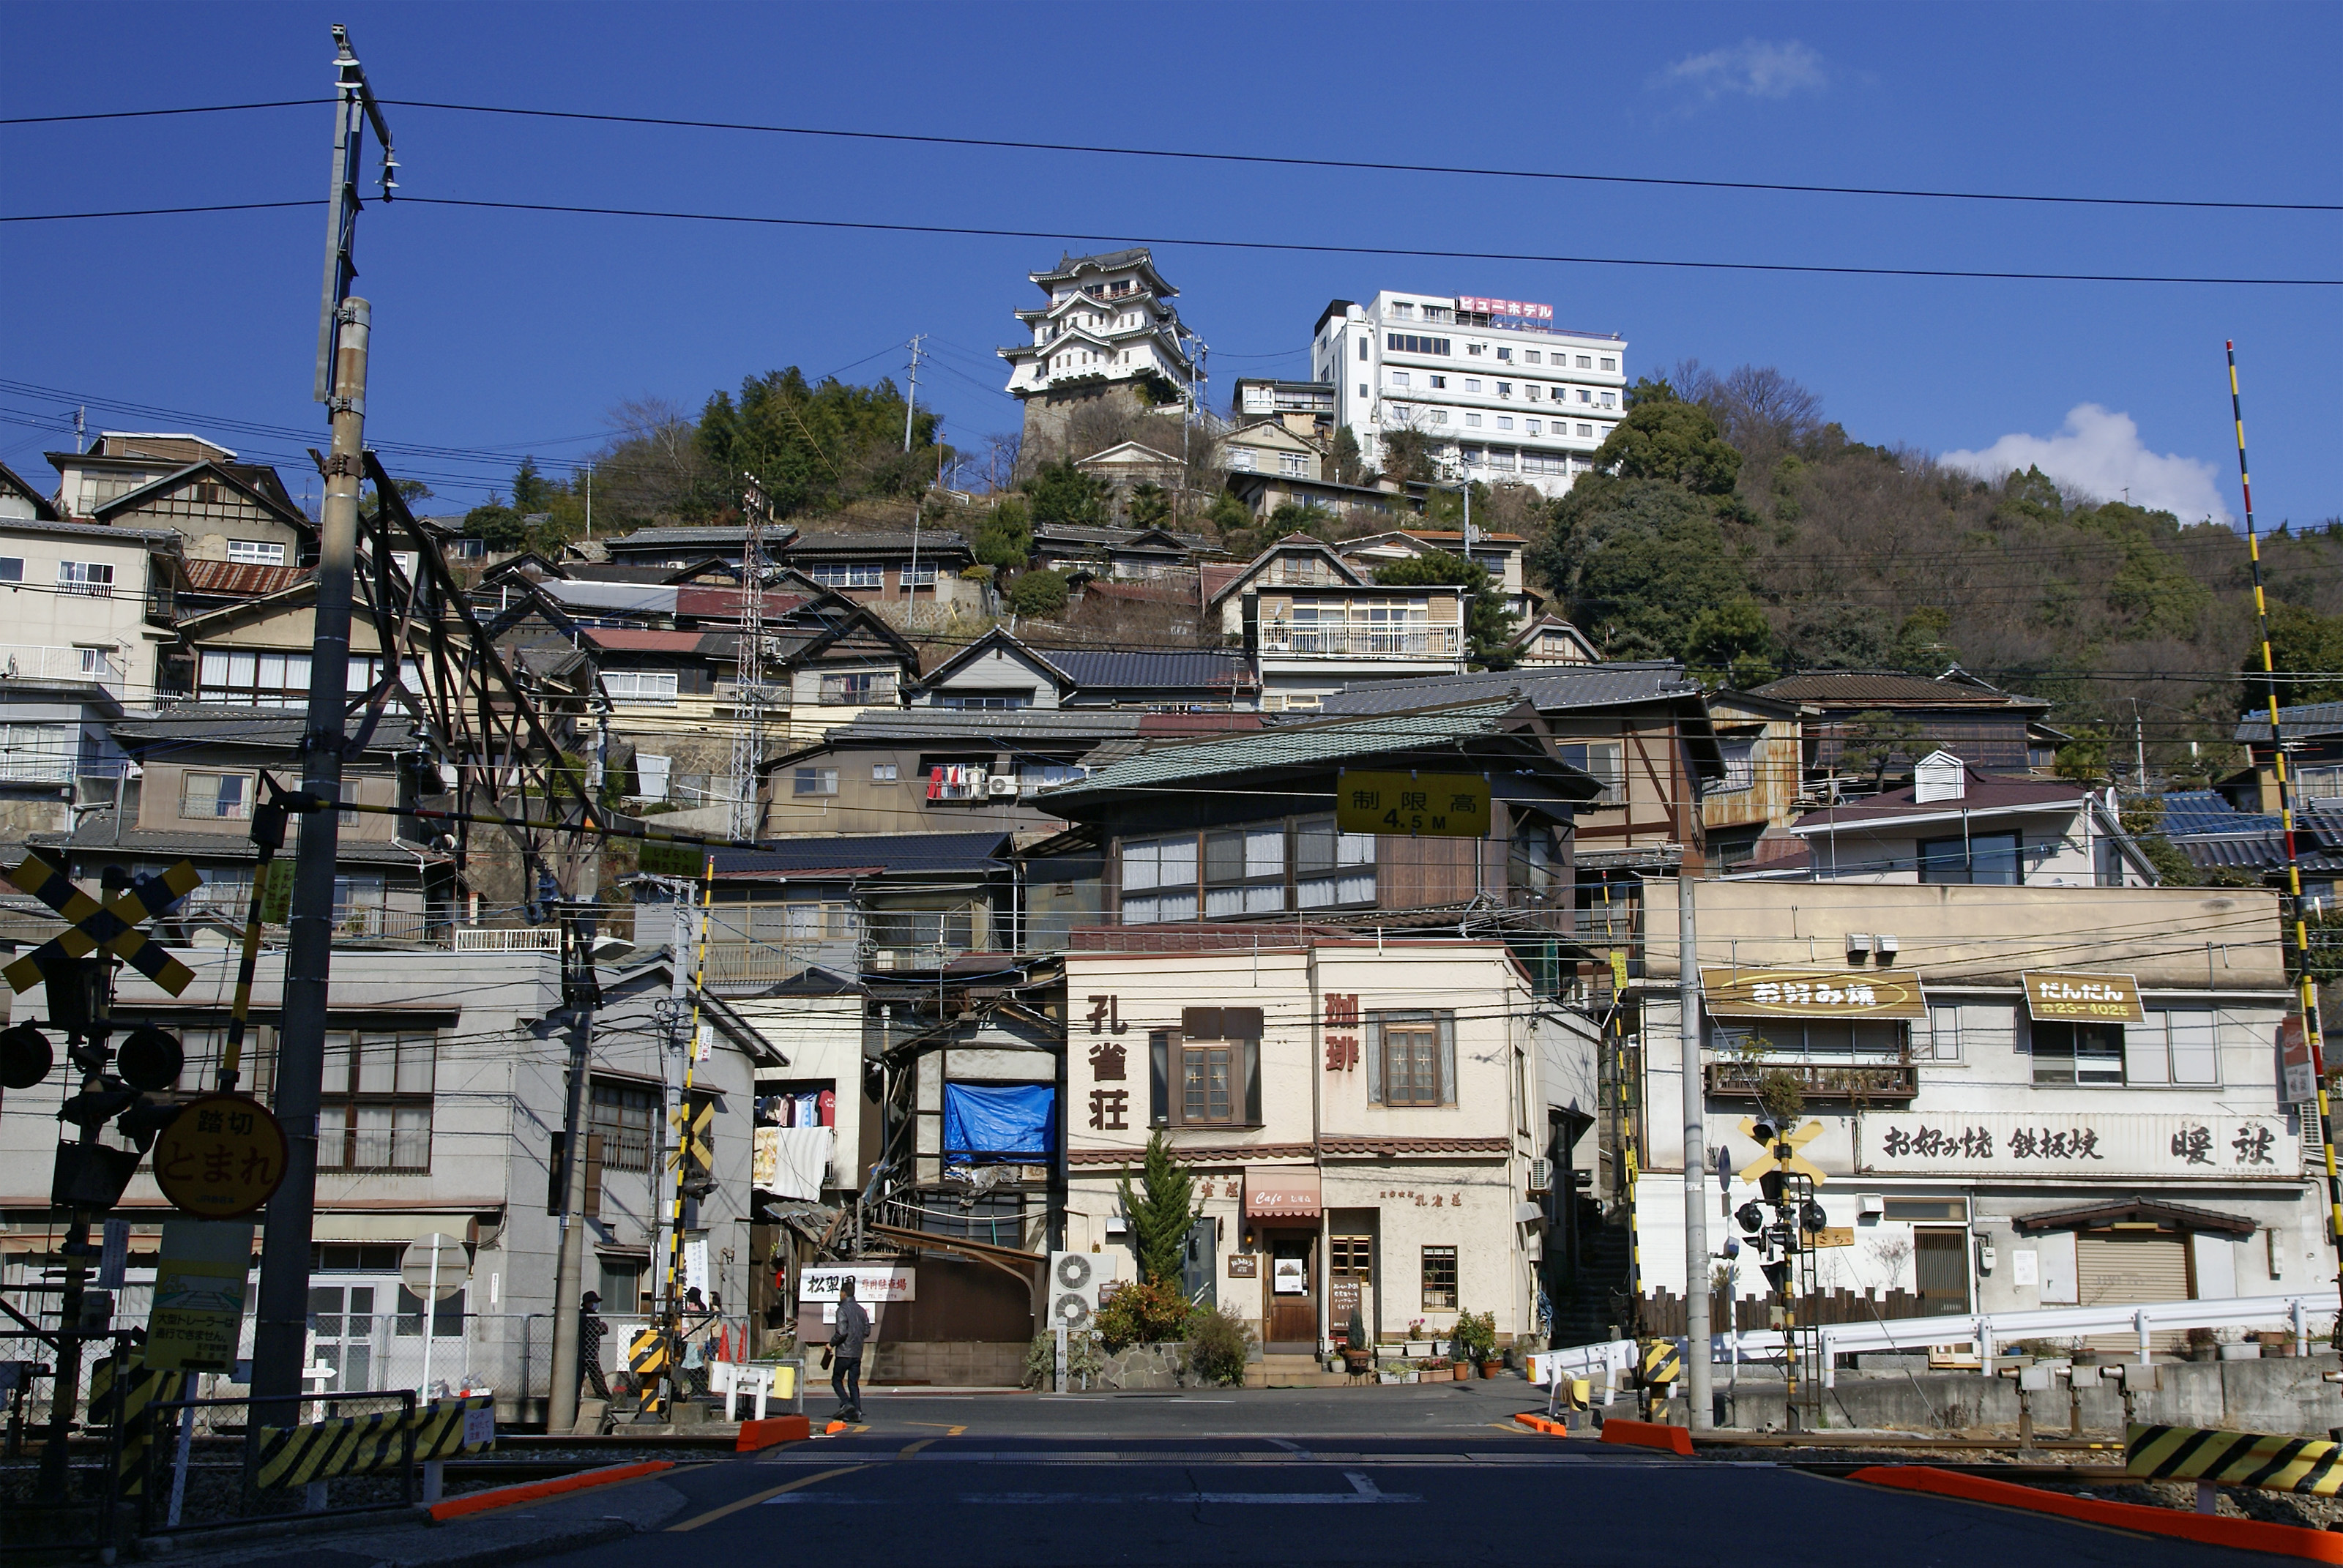 Onomichi Japan  city photos gallery : Onomichi castle01s3200 Wikimedia Commons